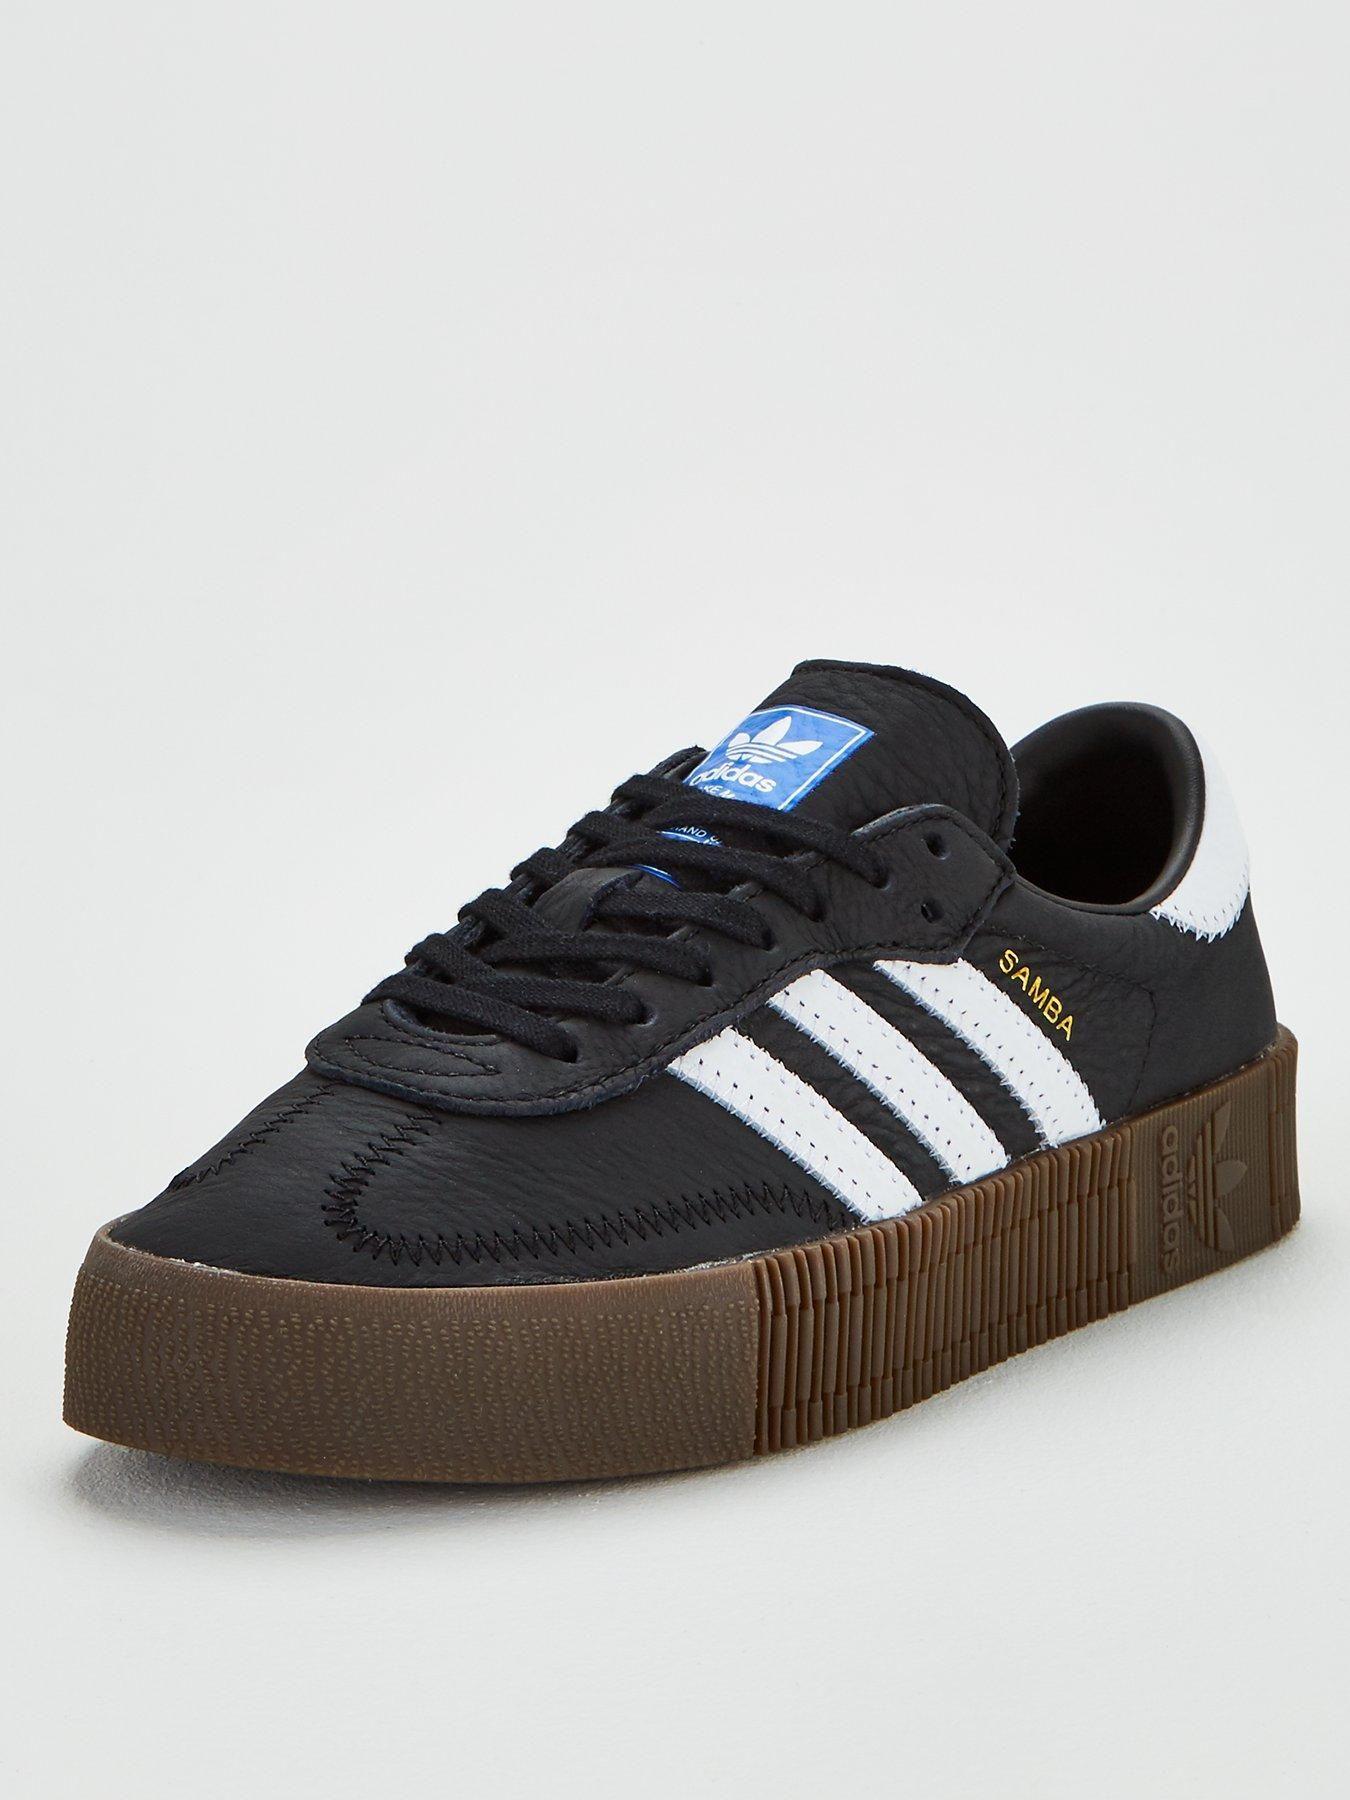 Sambarose - Black | Black, Adidas originals, High leg boots